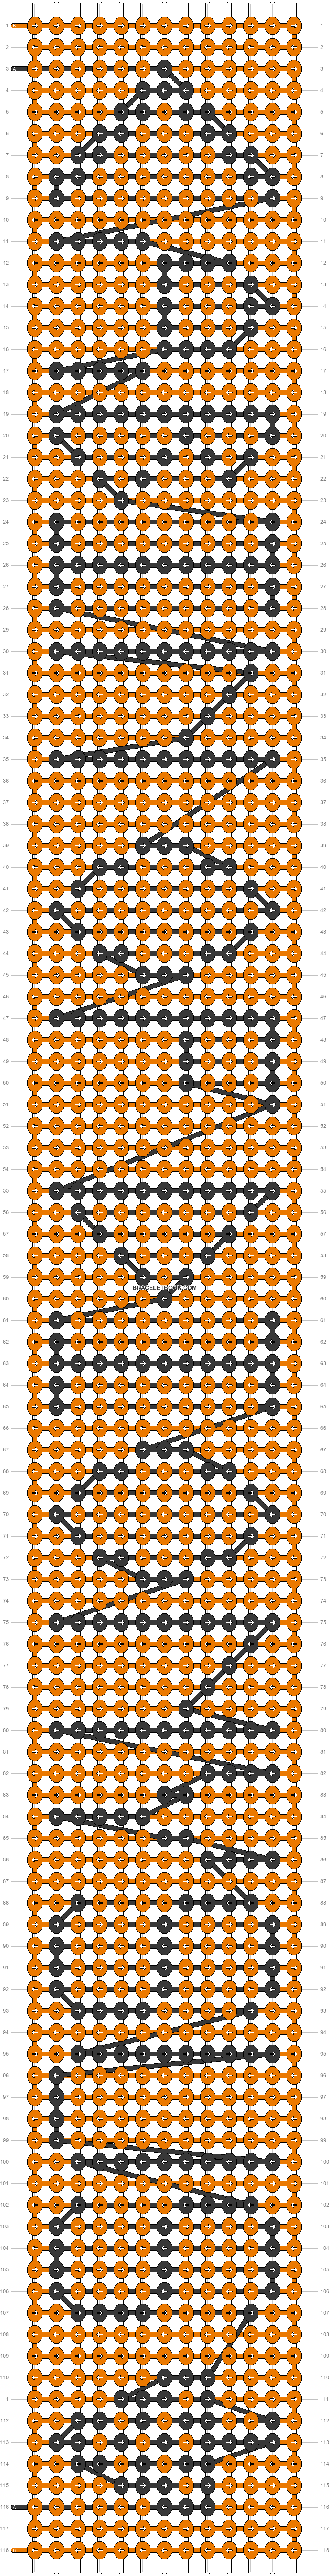 Alpha pattern #101042 pattern